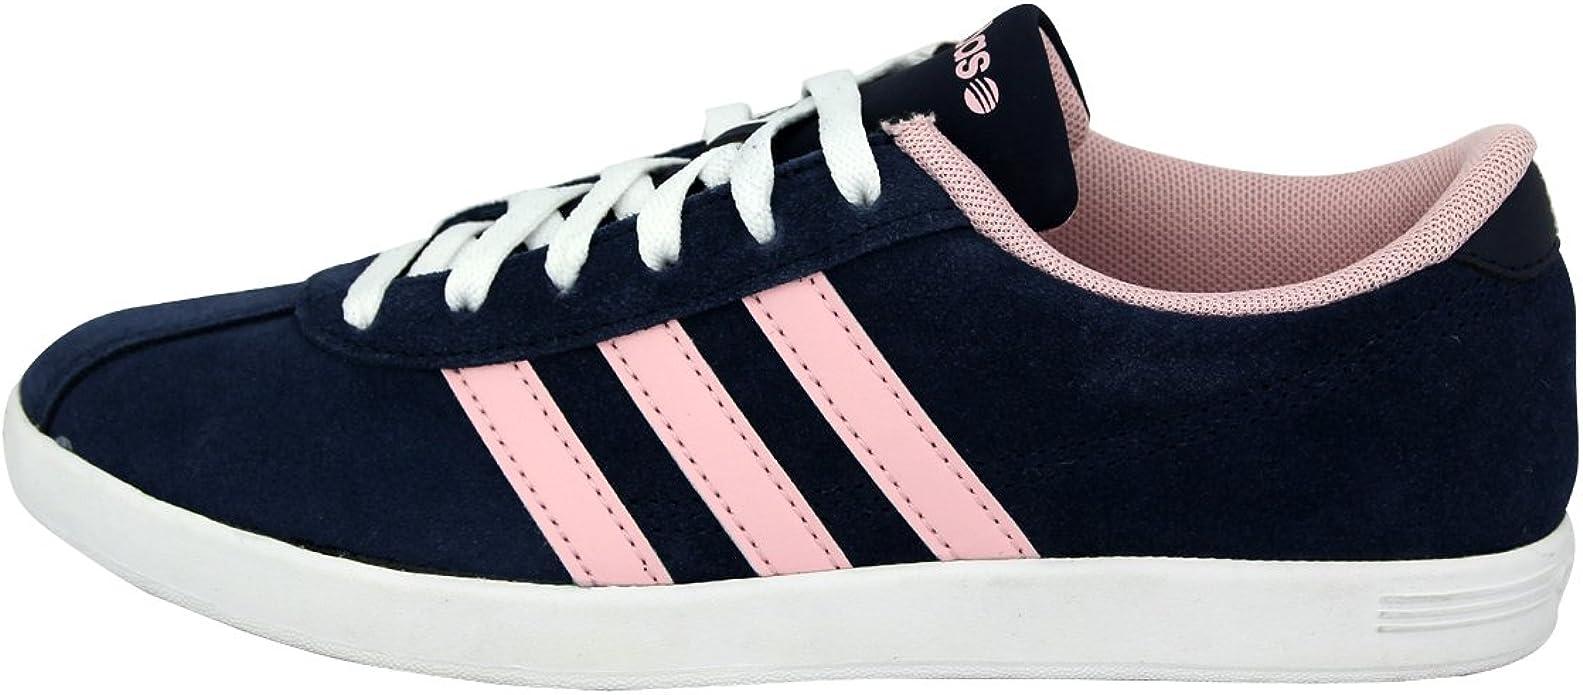 adidas neo bleu marine et rose